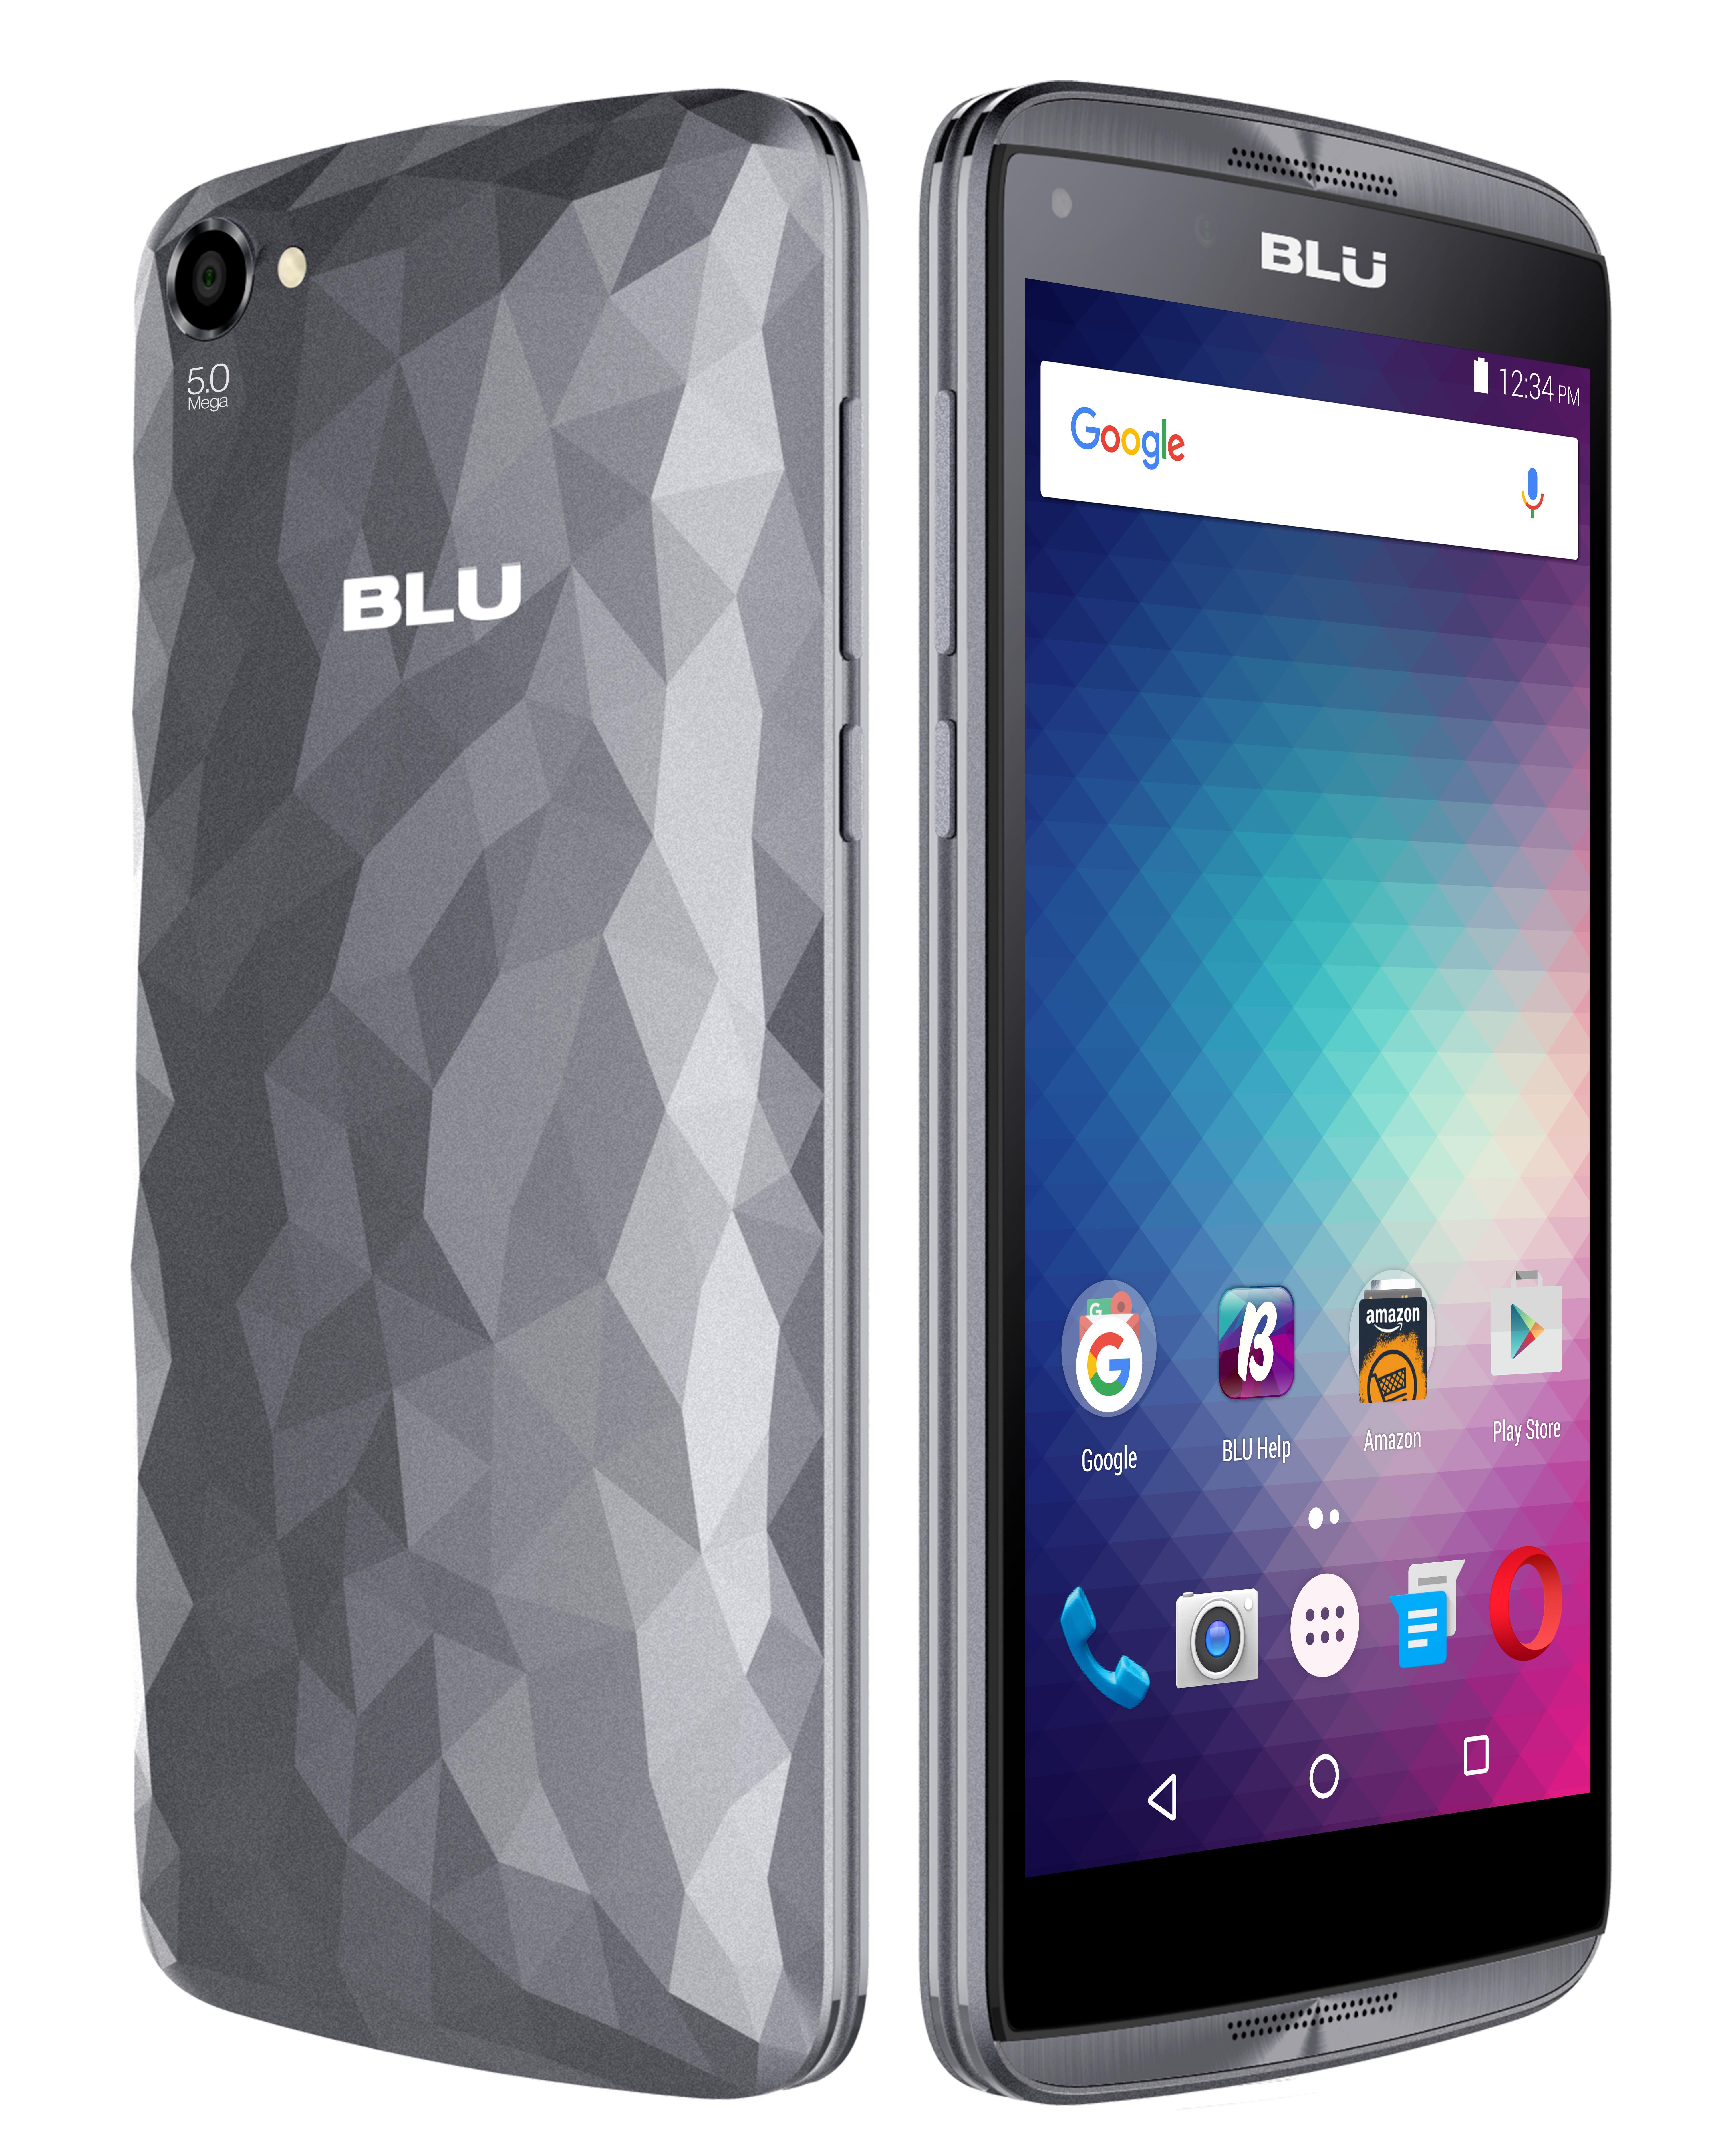 Android Diamond: BLU Energy Diamond E130U Unlocked GSM Quad-Core Android